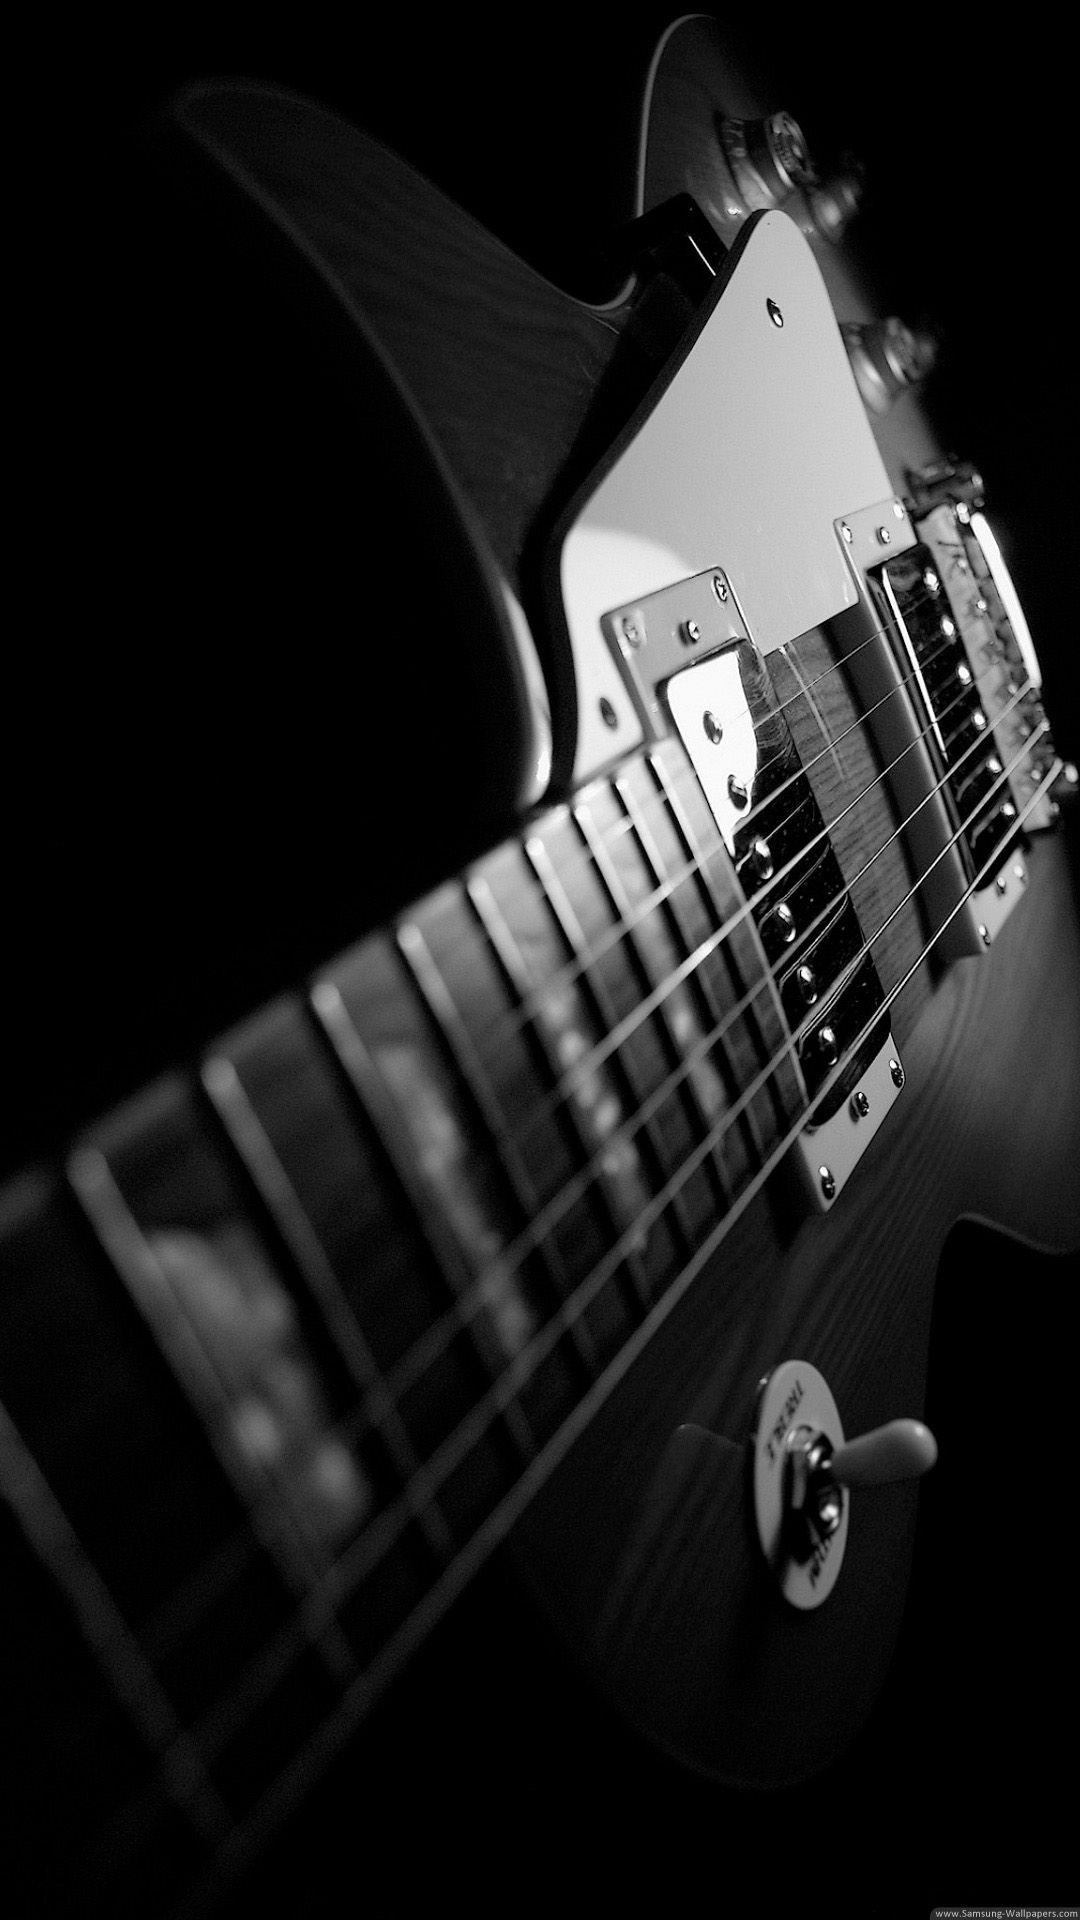 Fondos De Pantalla De Guitarras Fondosmil